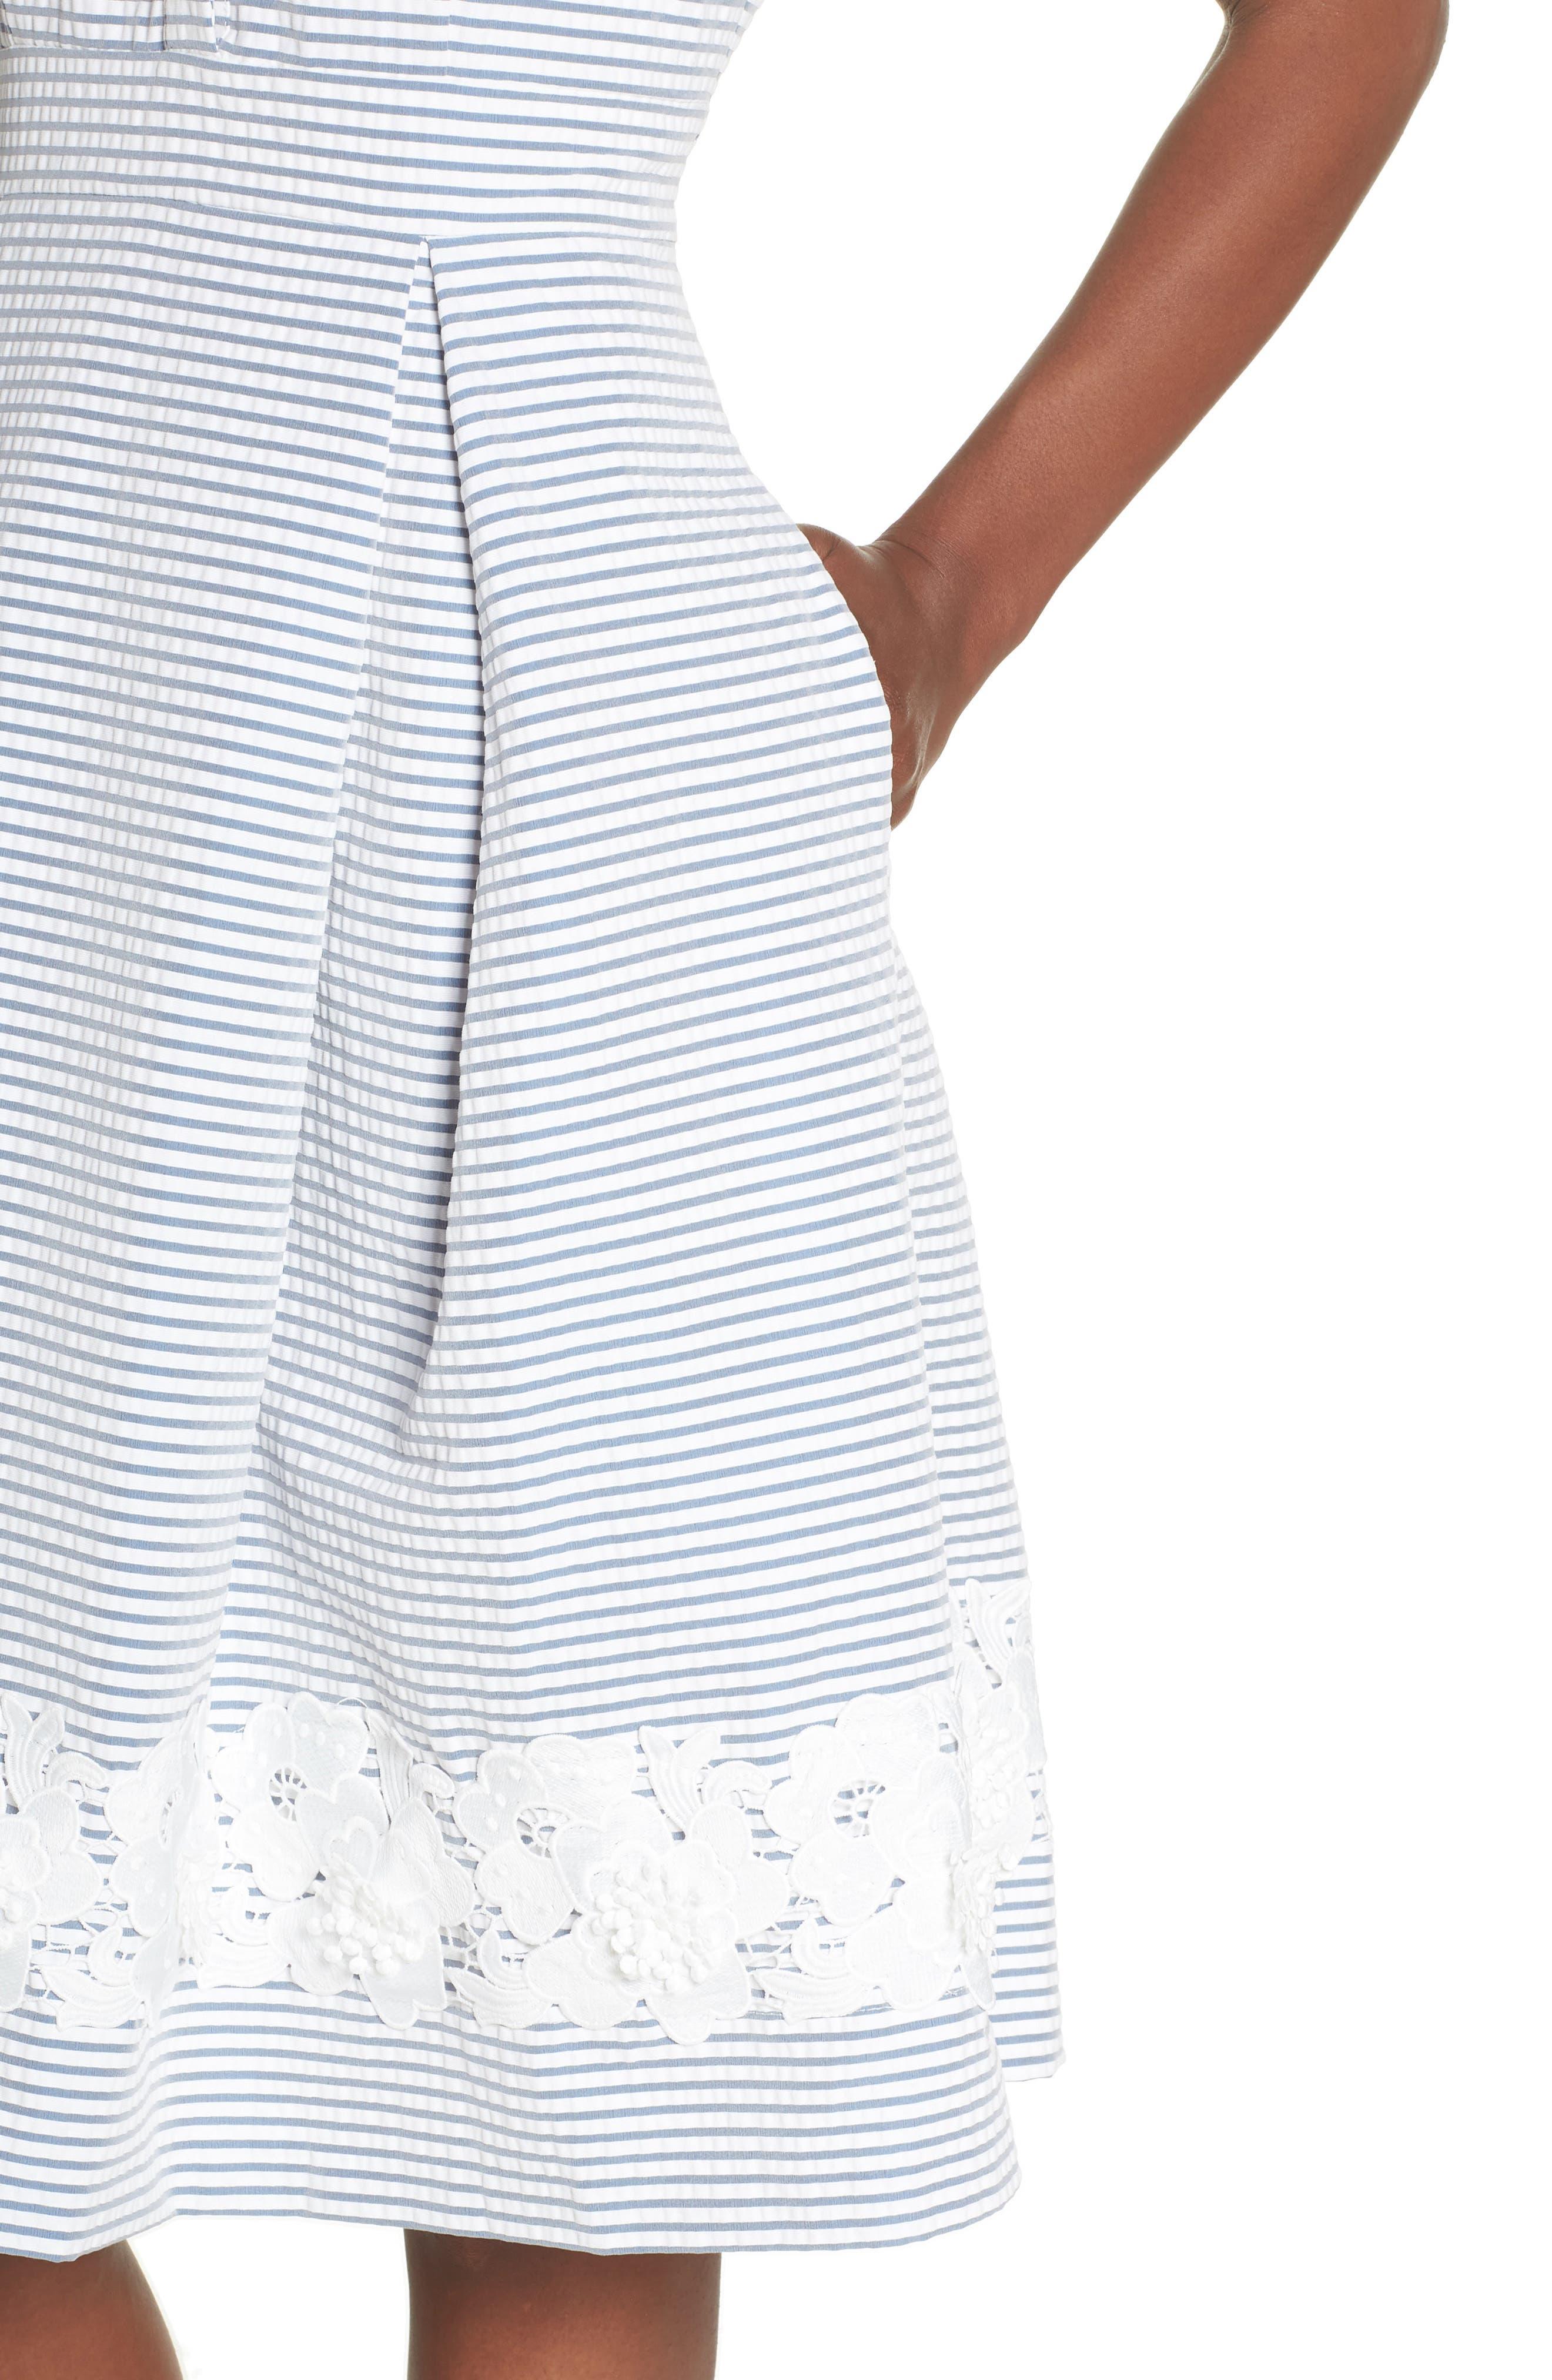 Halter Shirtdress,                             Alternate thumbnail 4, color,                             434